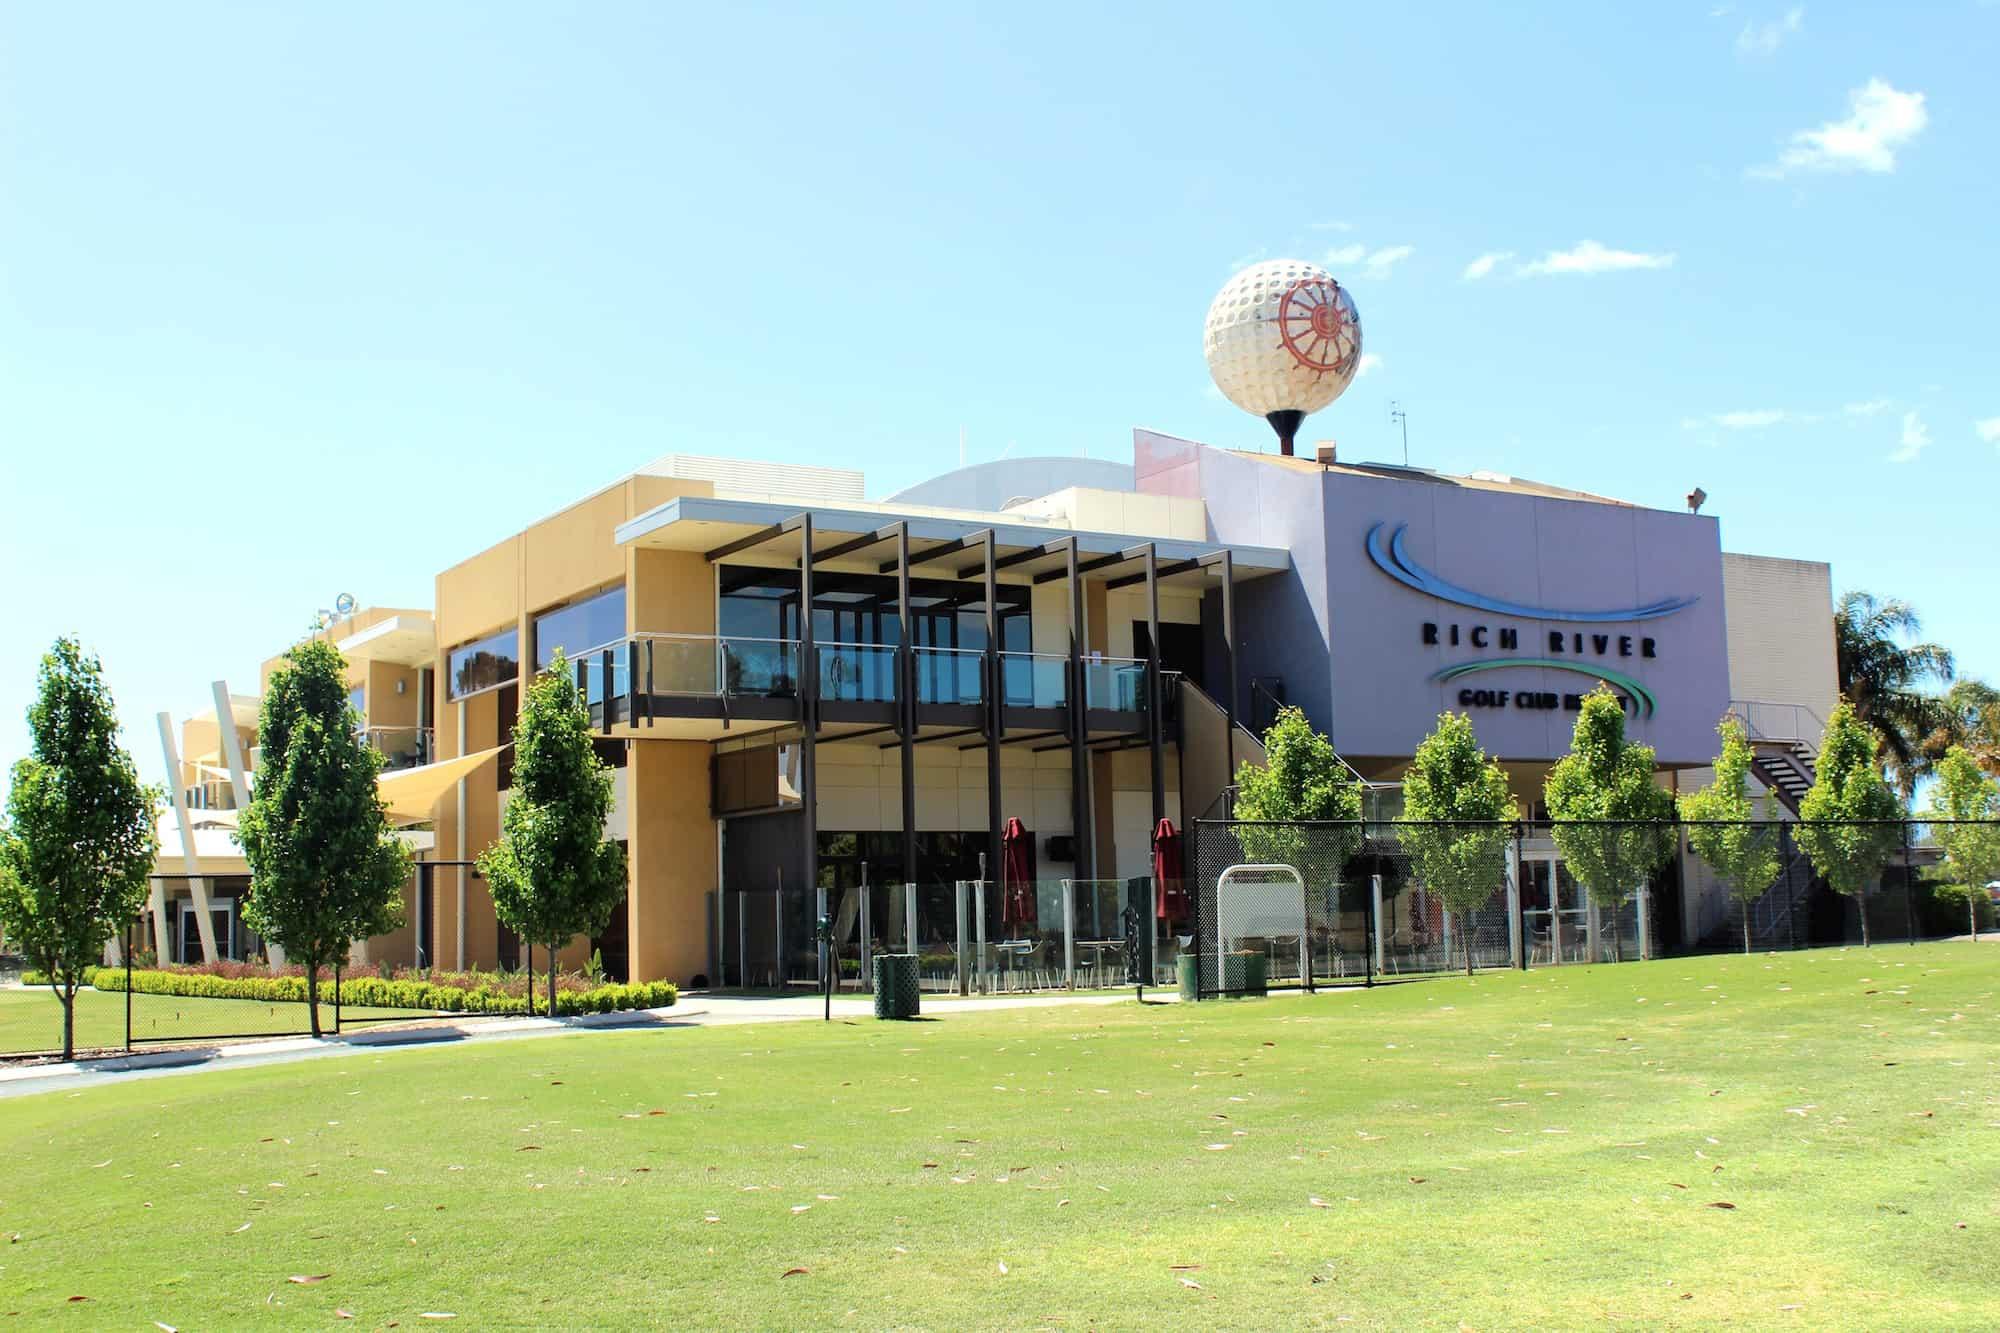 rich river golf club building